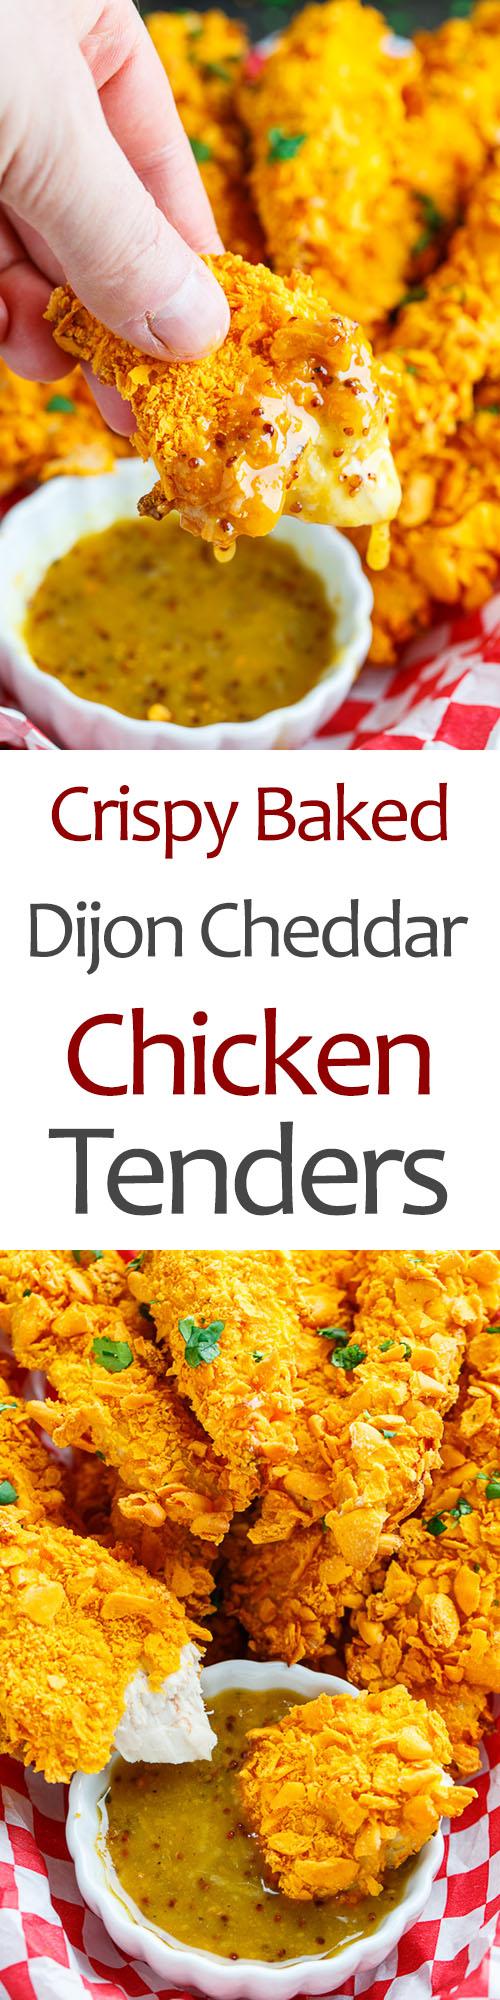 Crispy Baked Cheddar Dijon Chicken Tenders